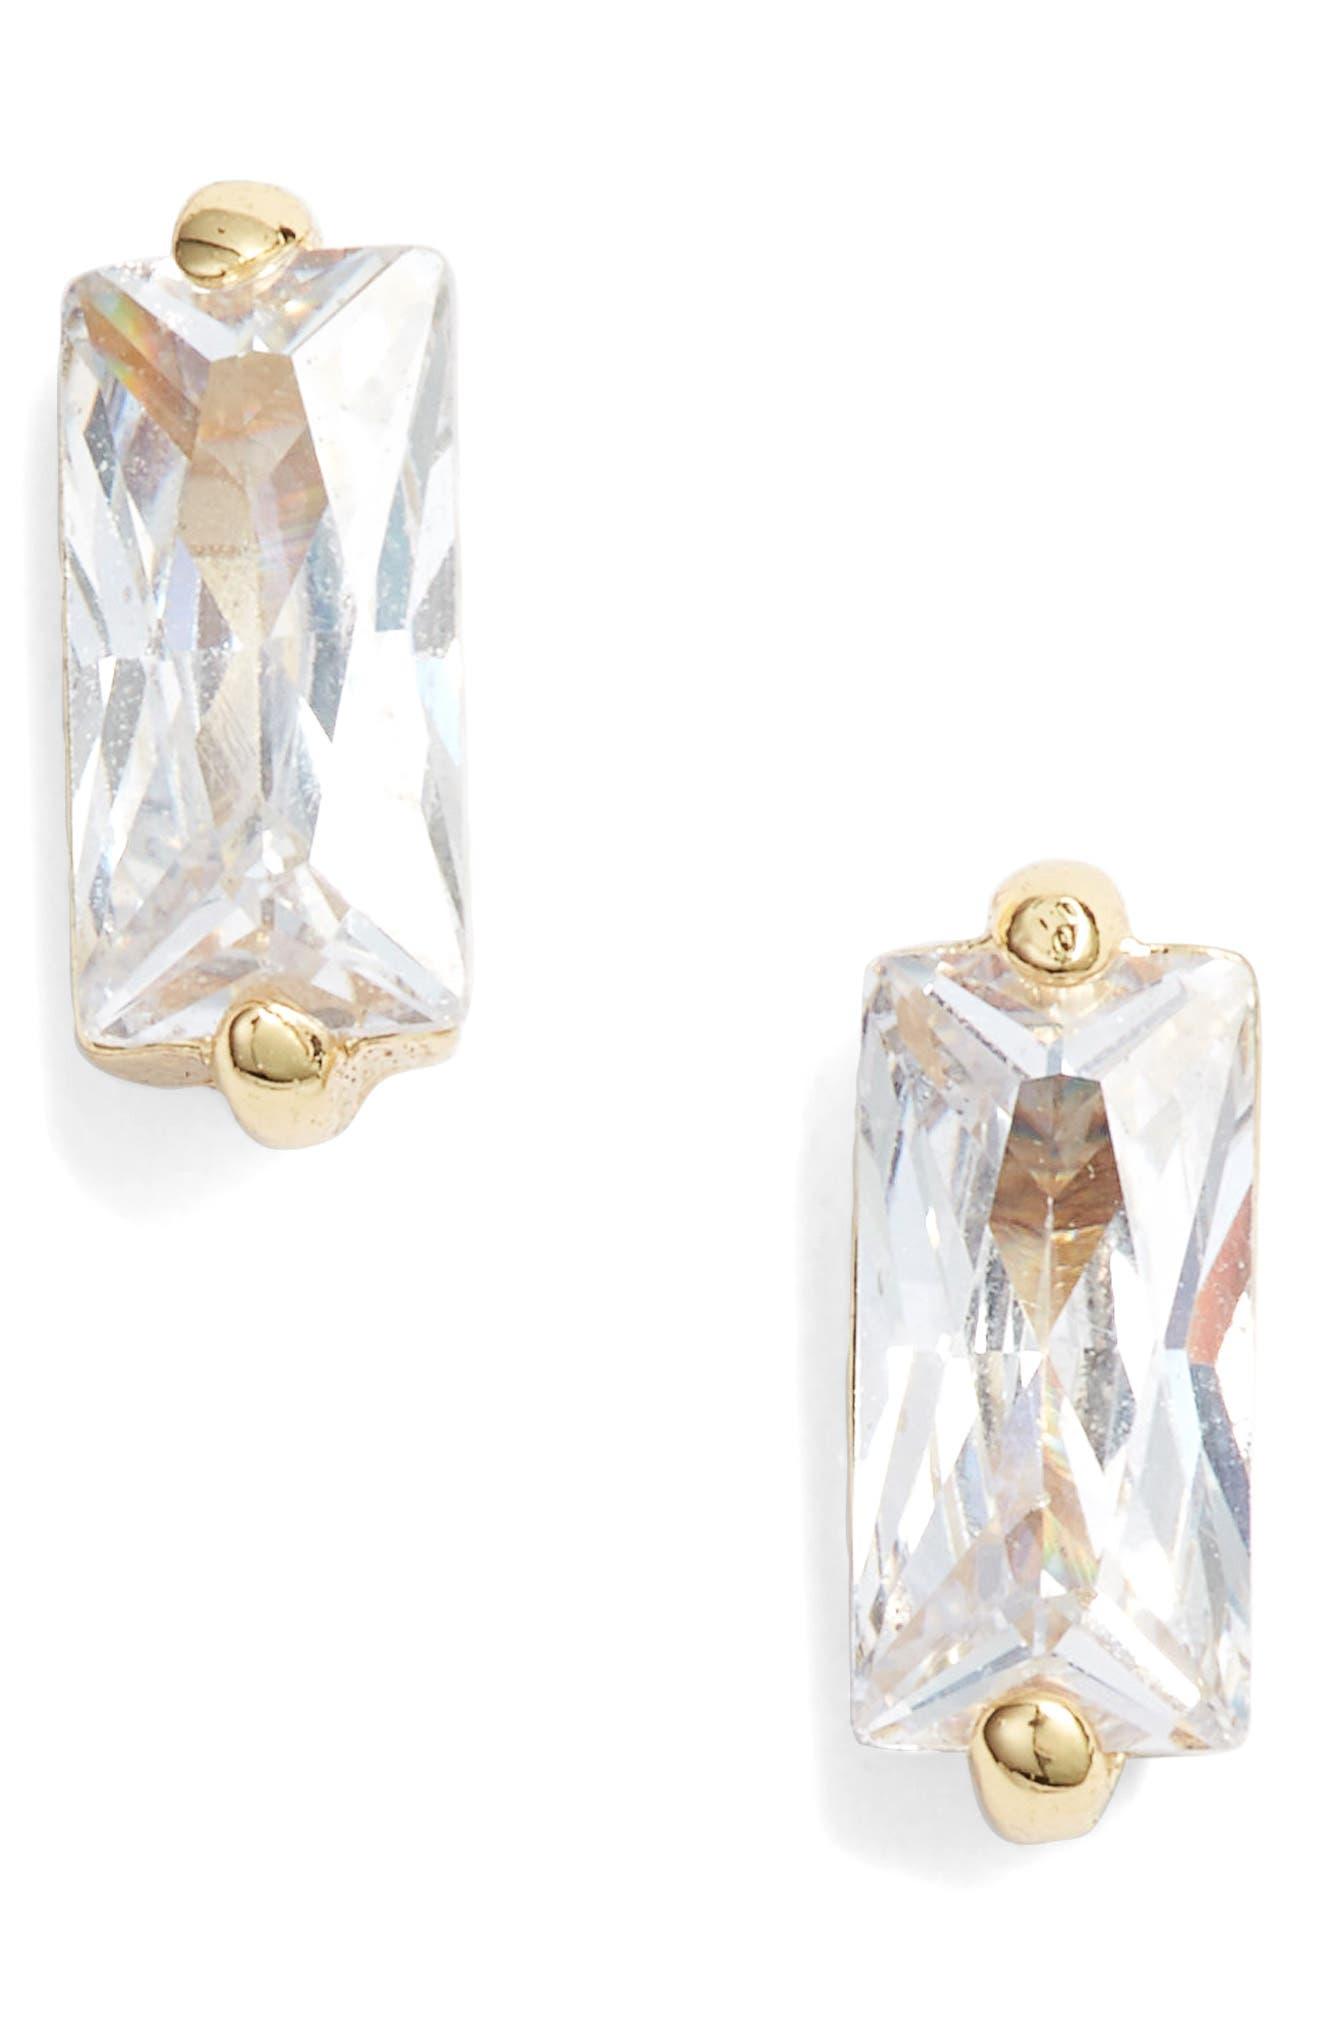 Amara Stud Earrings,                         Main,                         color, GOLD